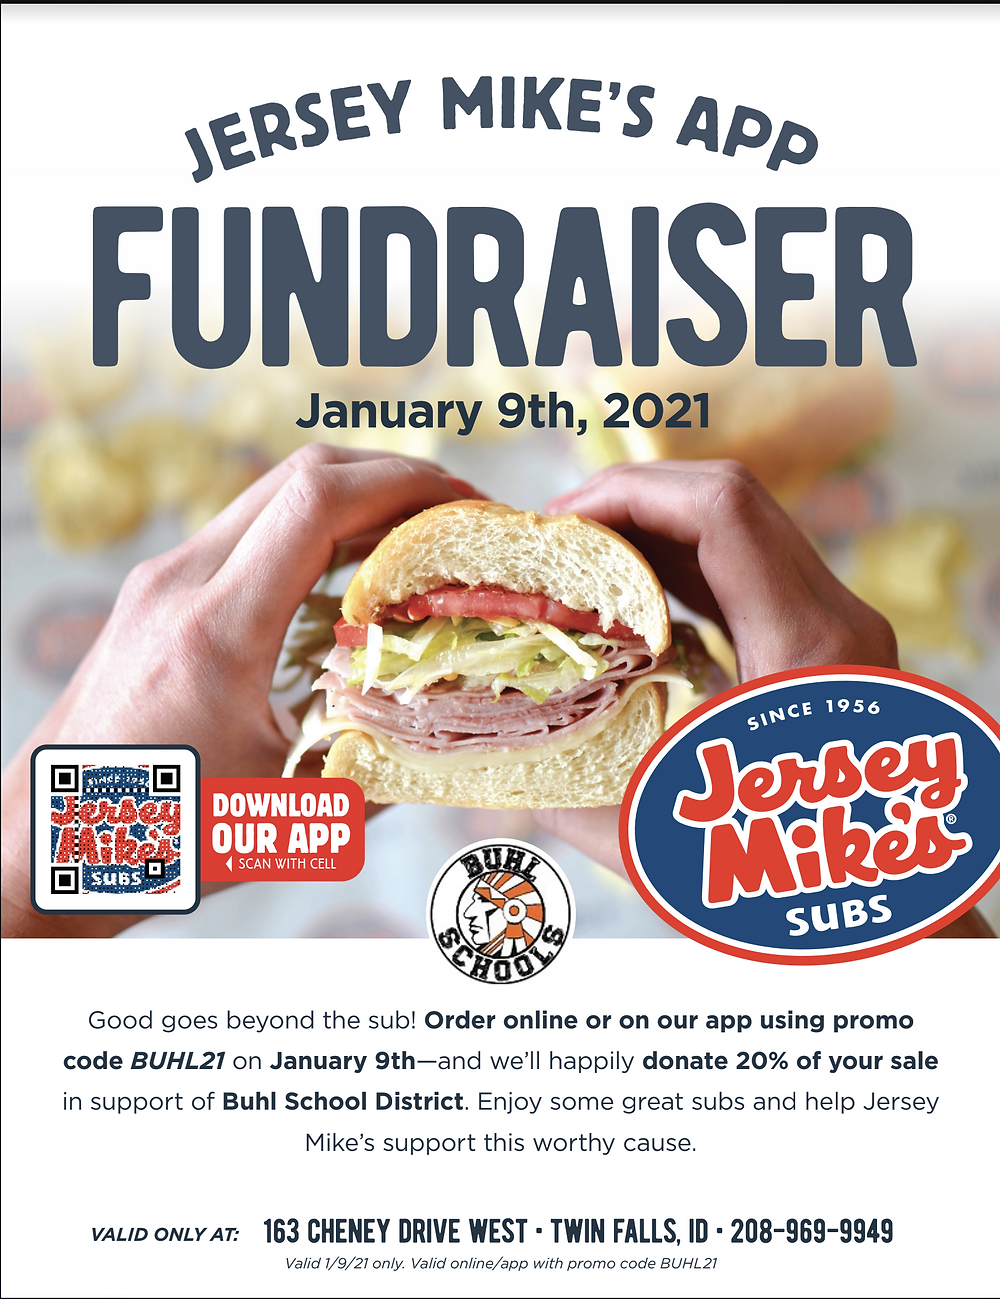 Jersey Mike's App Fundraiser Flyer